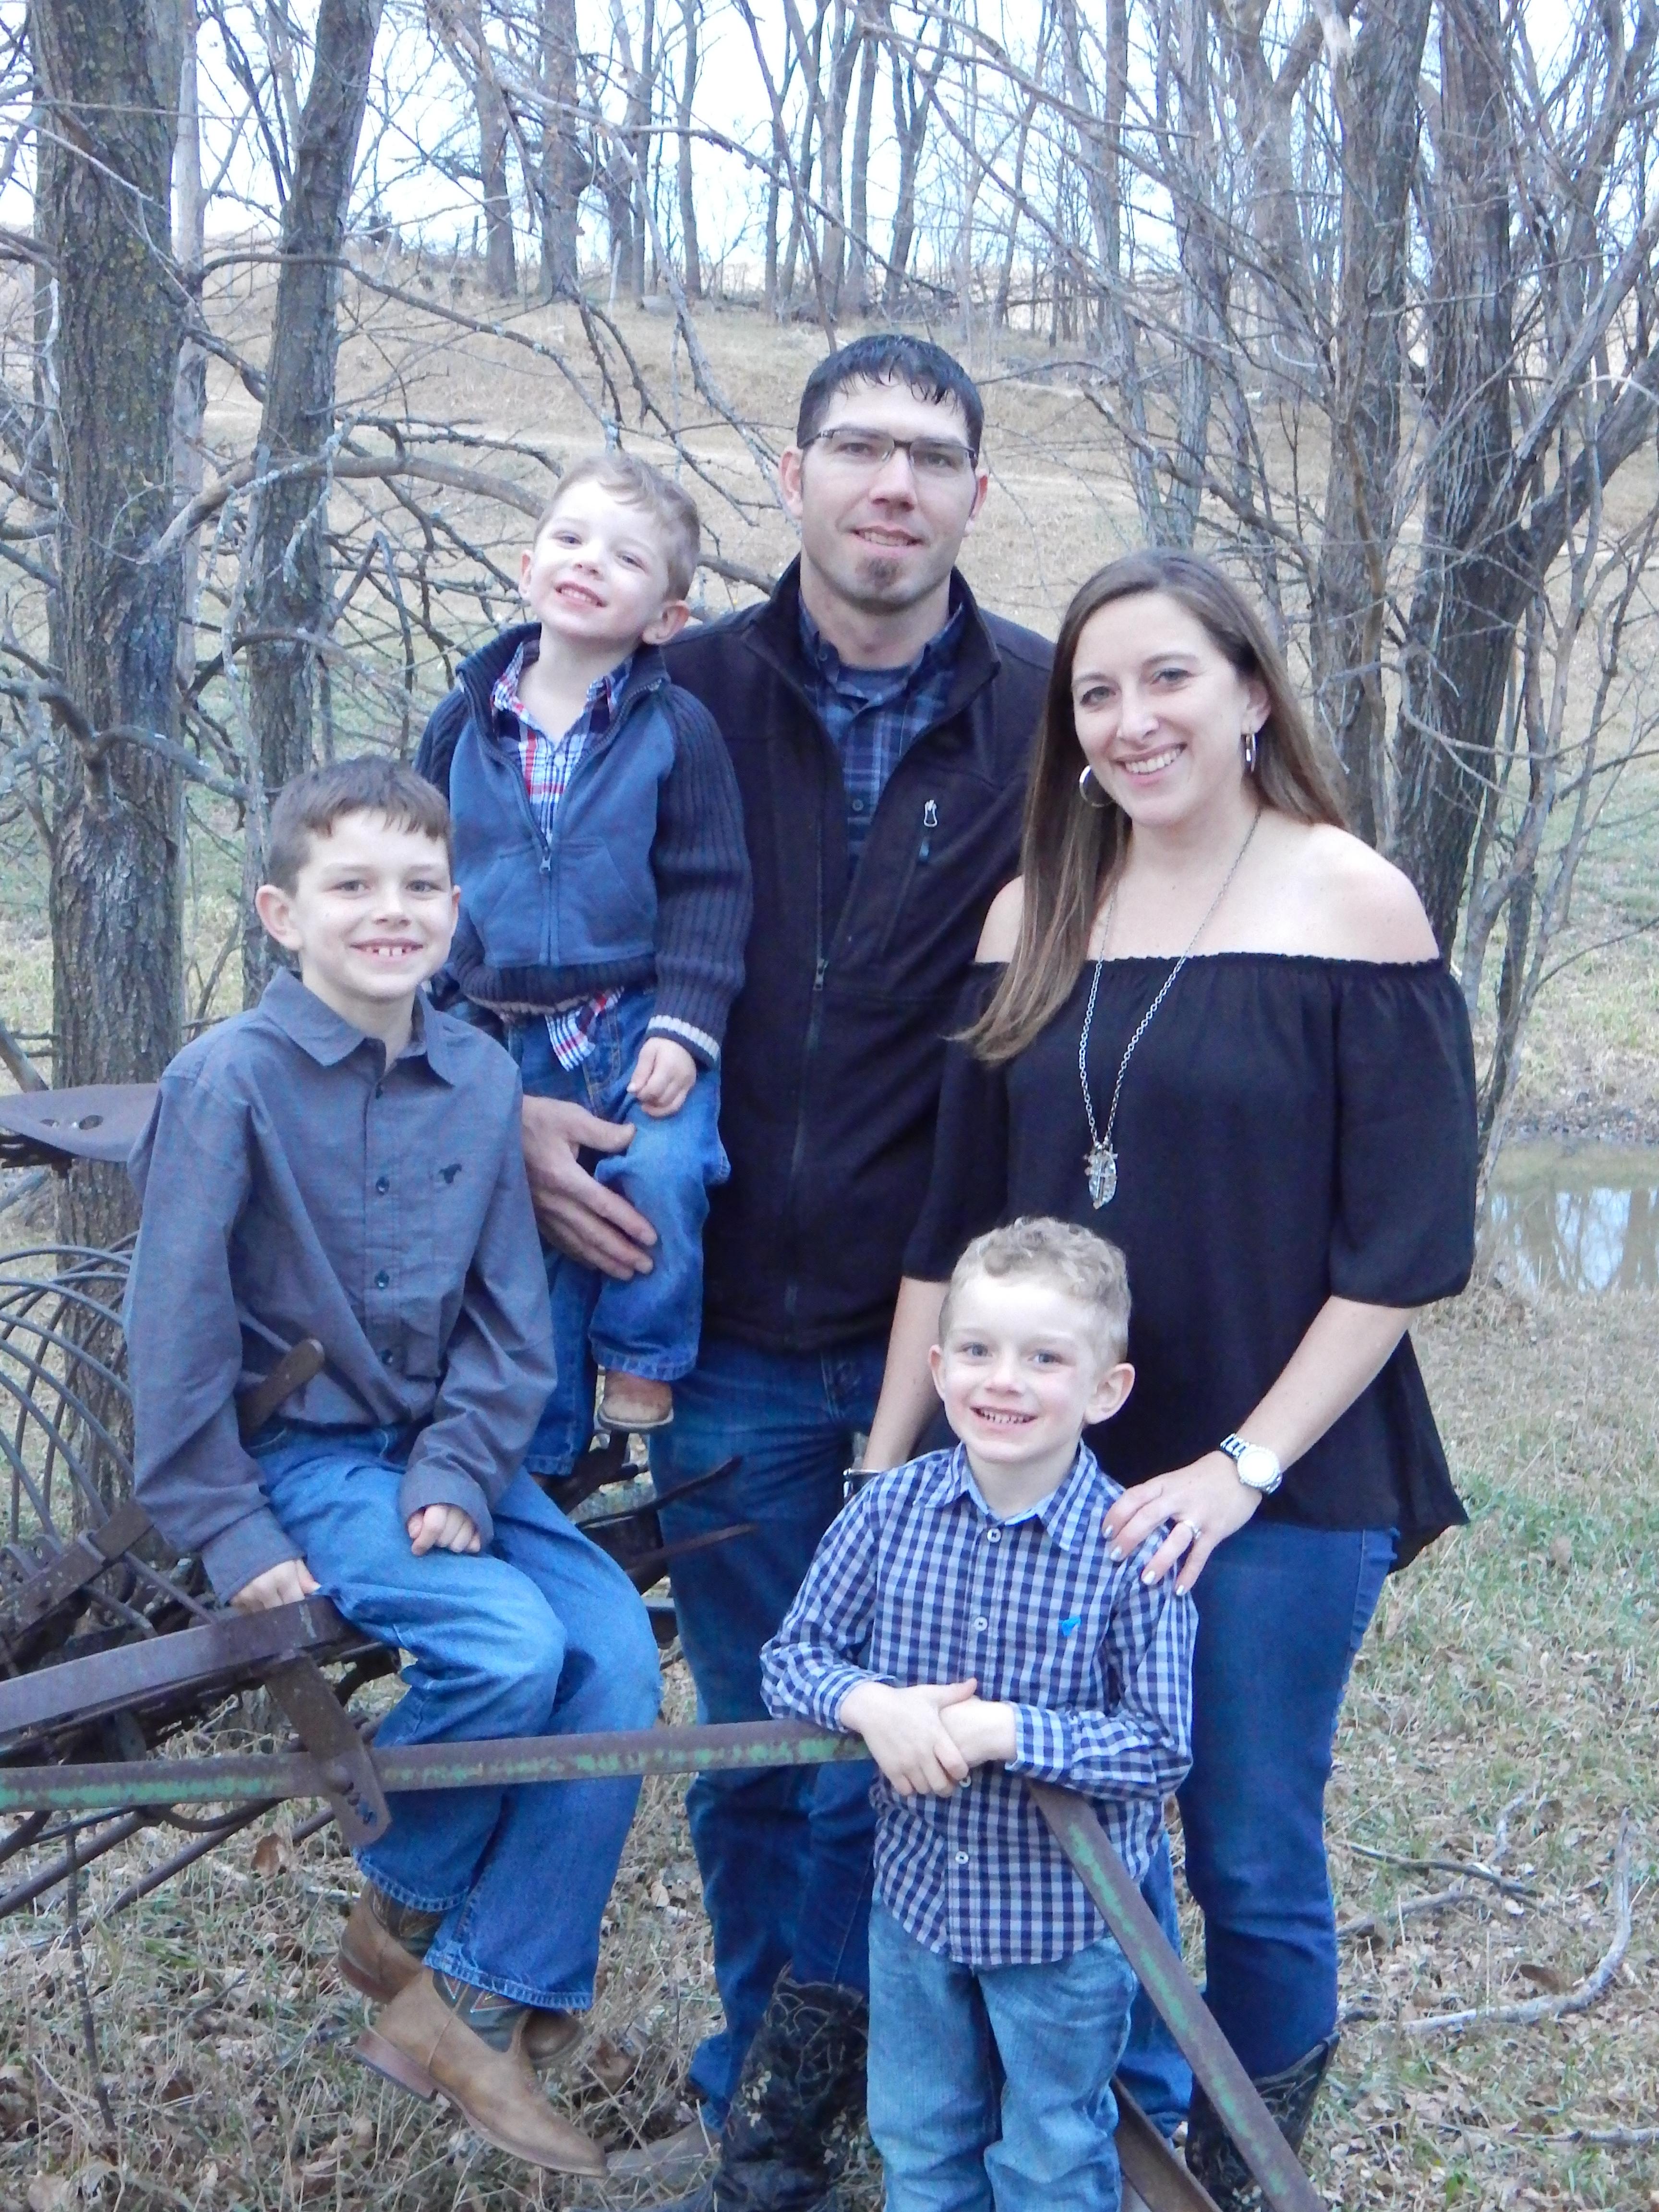 FFA Alumni Spotlight: Kimberly Fehringer